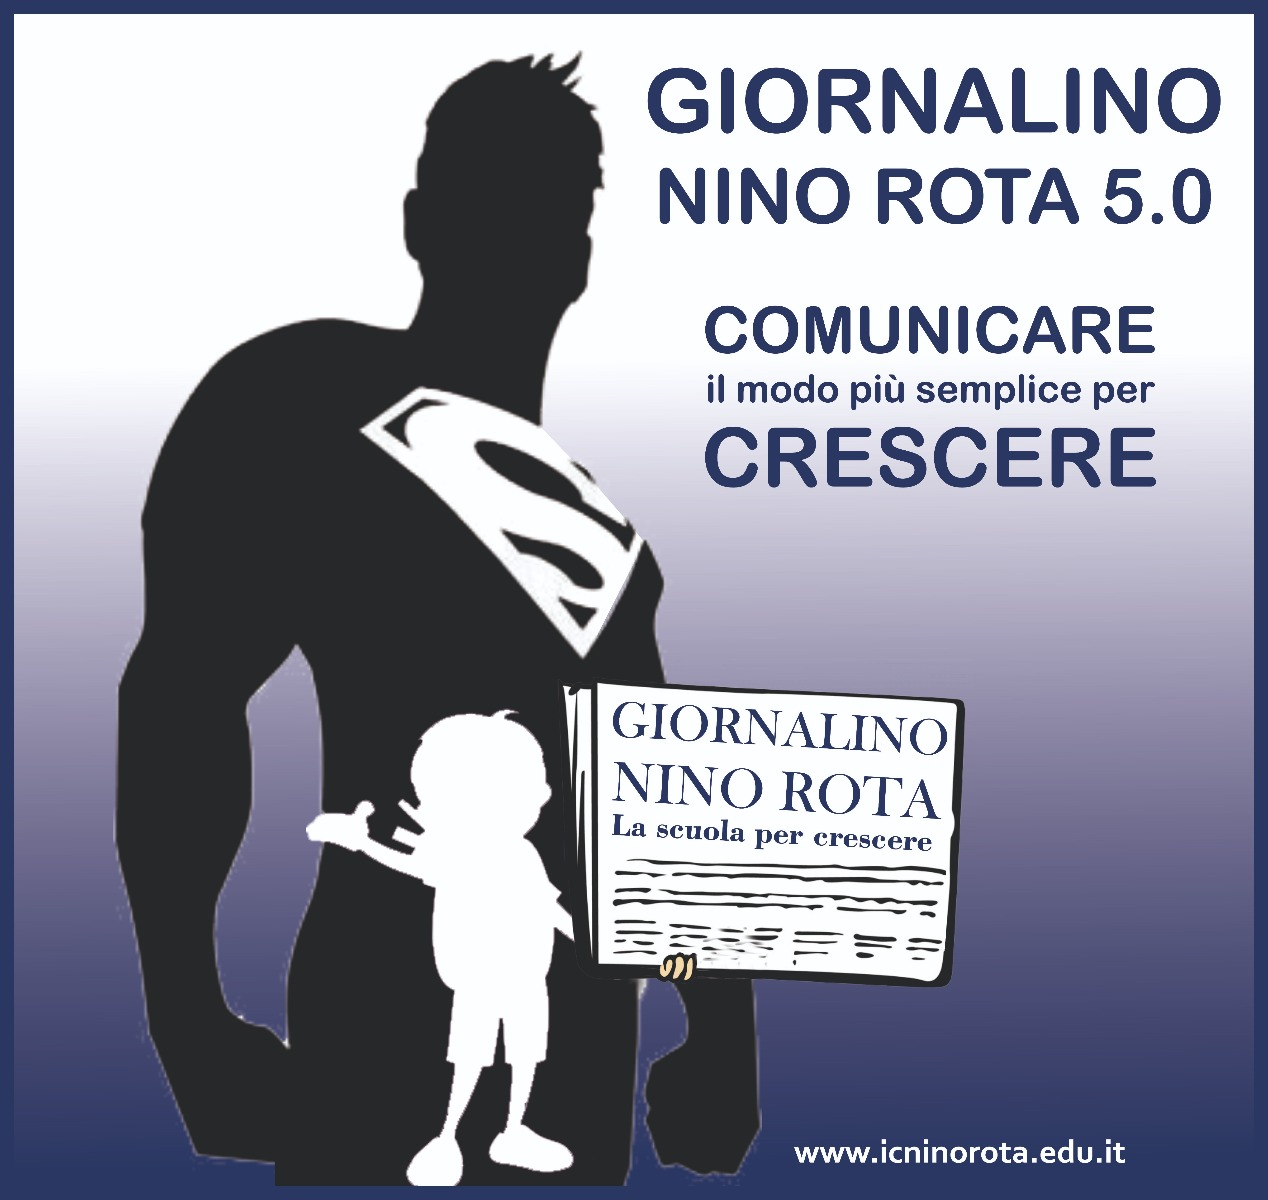 GIORNALINO NINO ROTA 5.0